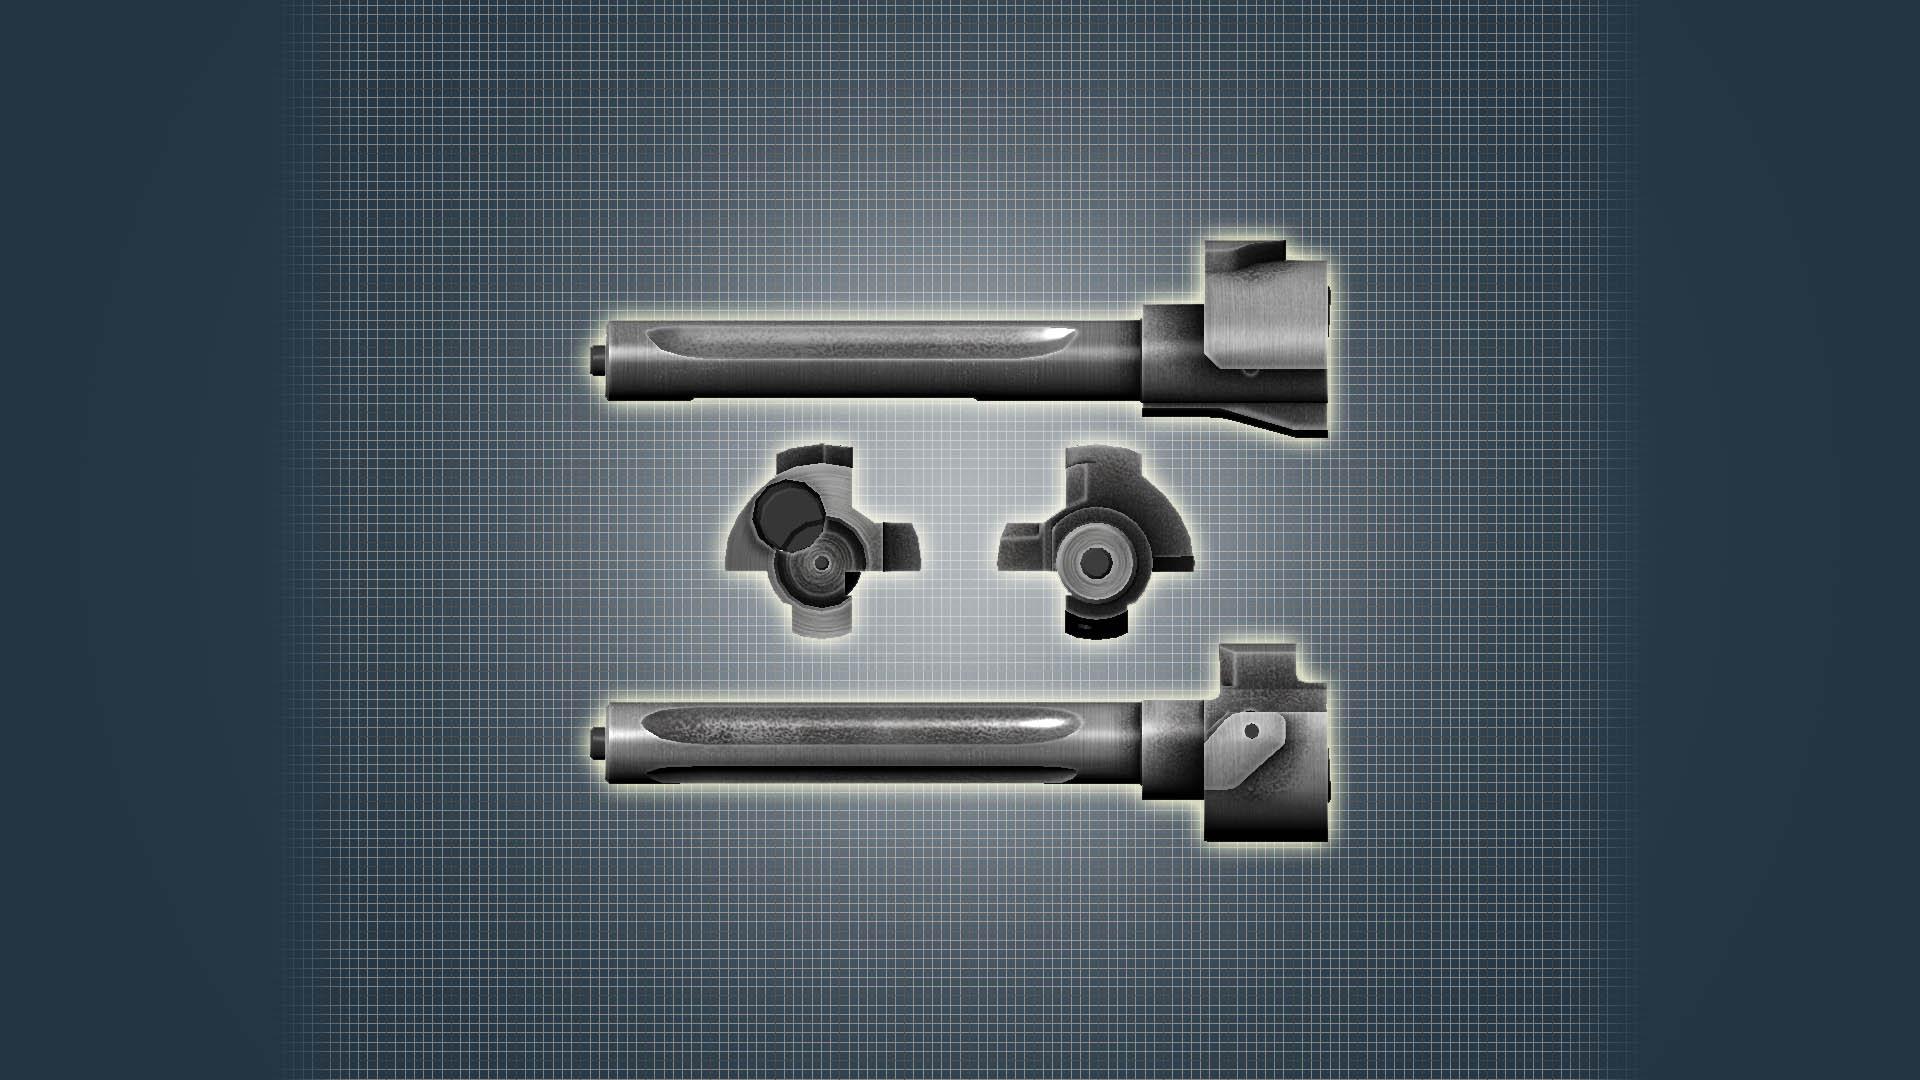 World of Guns: Gun Disassembly - AK 47 bolt   Steam Trading